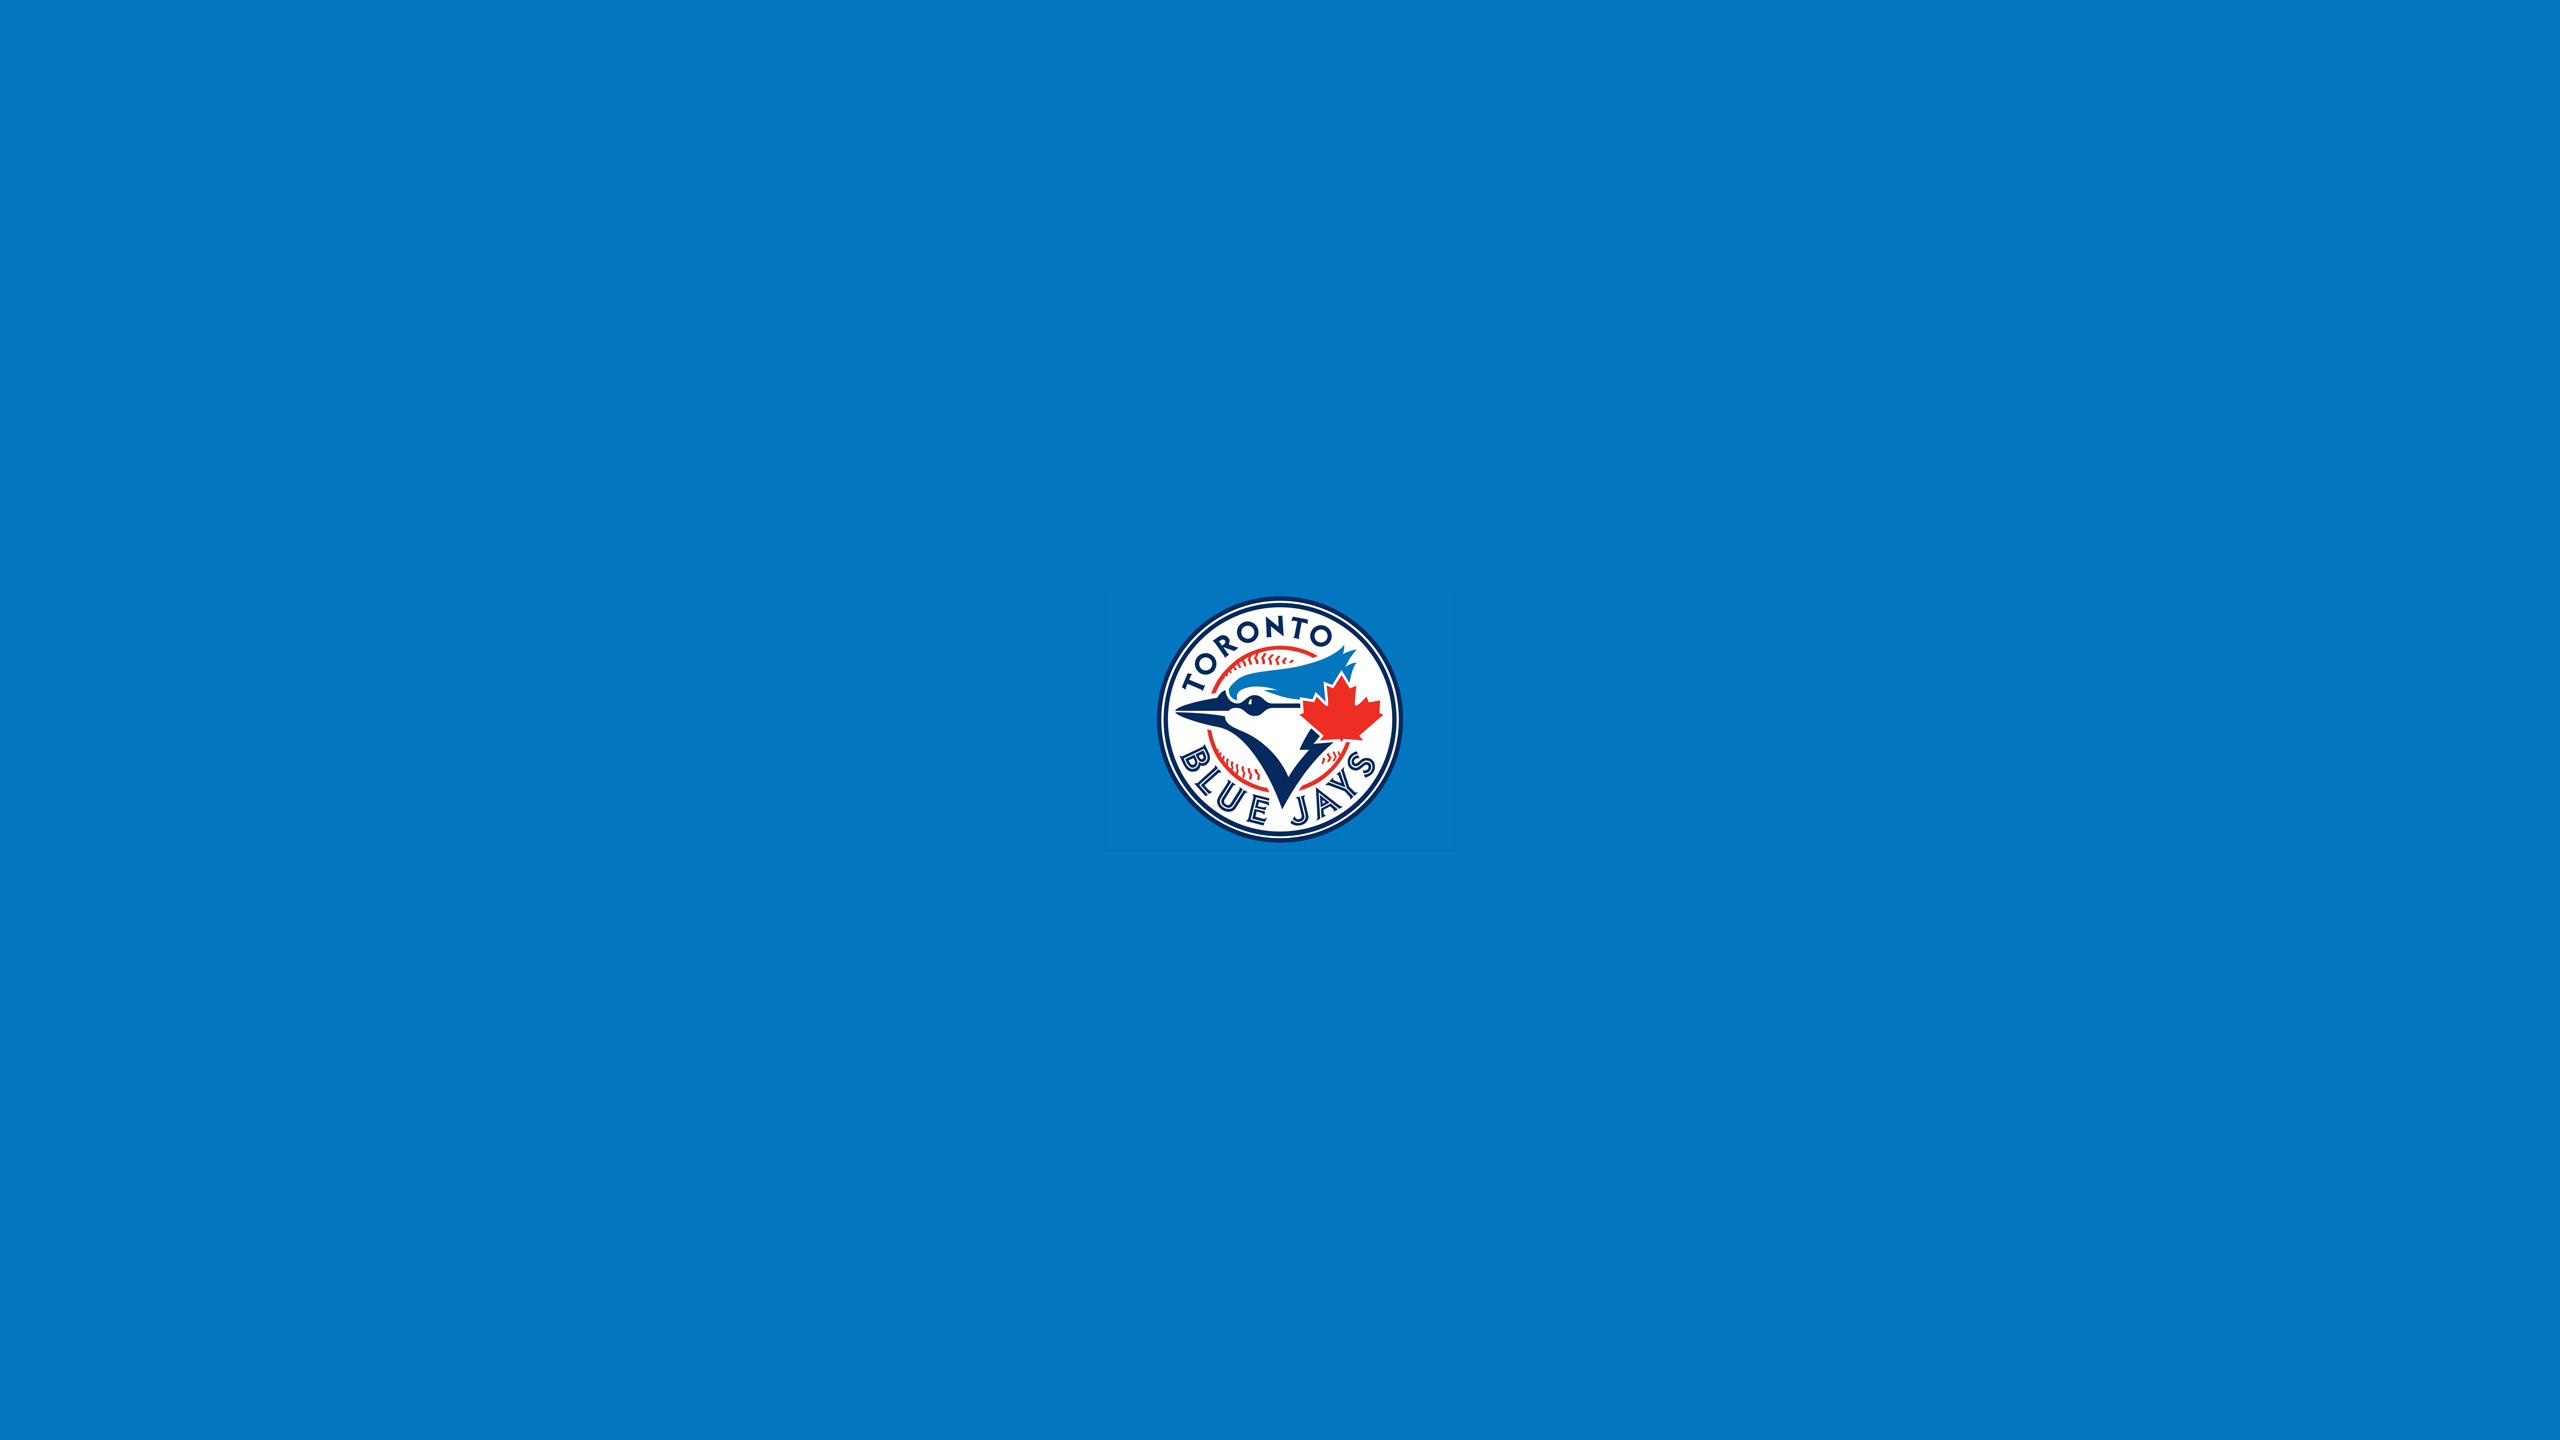 Toronto Blue Jays images Toronto Blue Jays HD wallpaper and background  photos